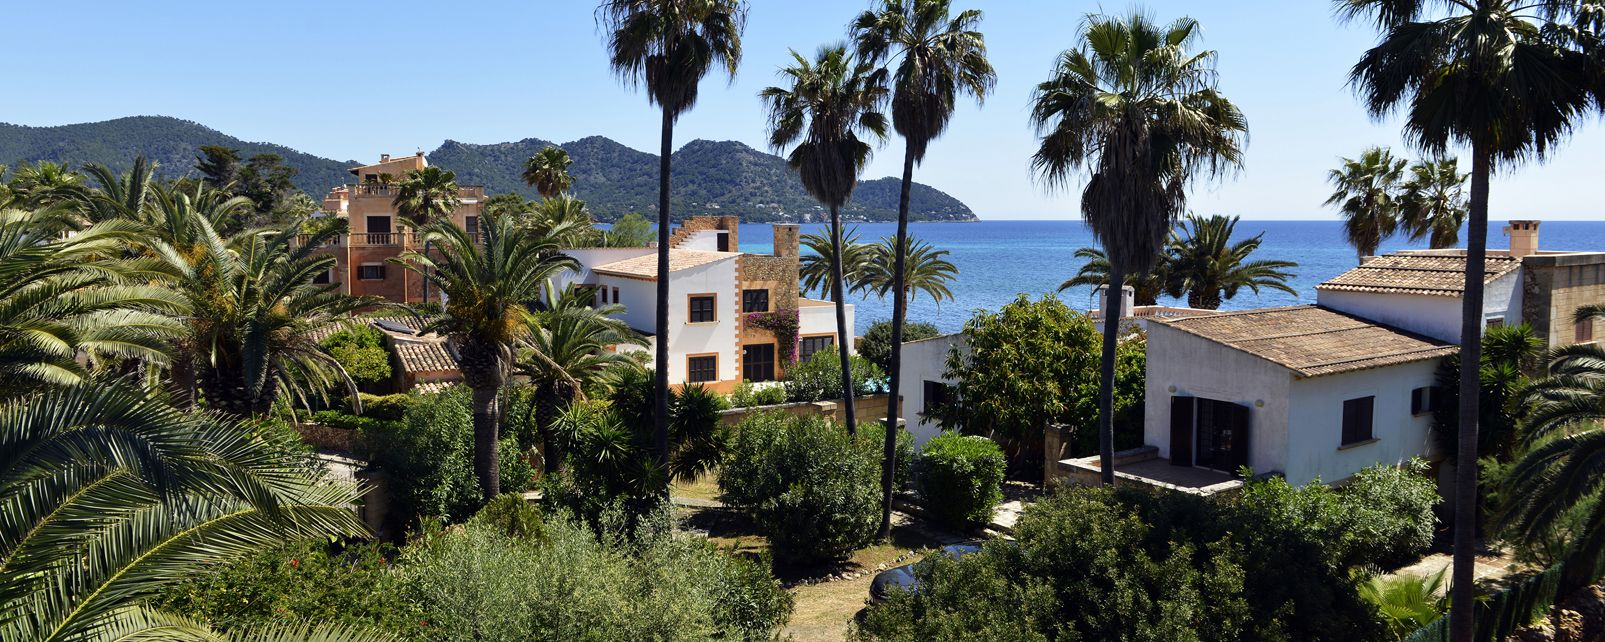 TUI Family Life Mallorca Mar